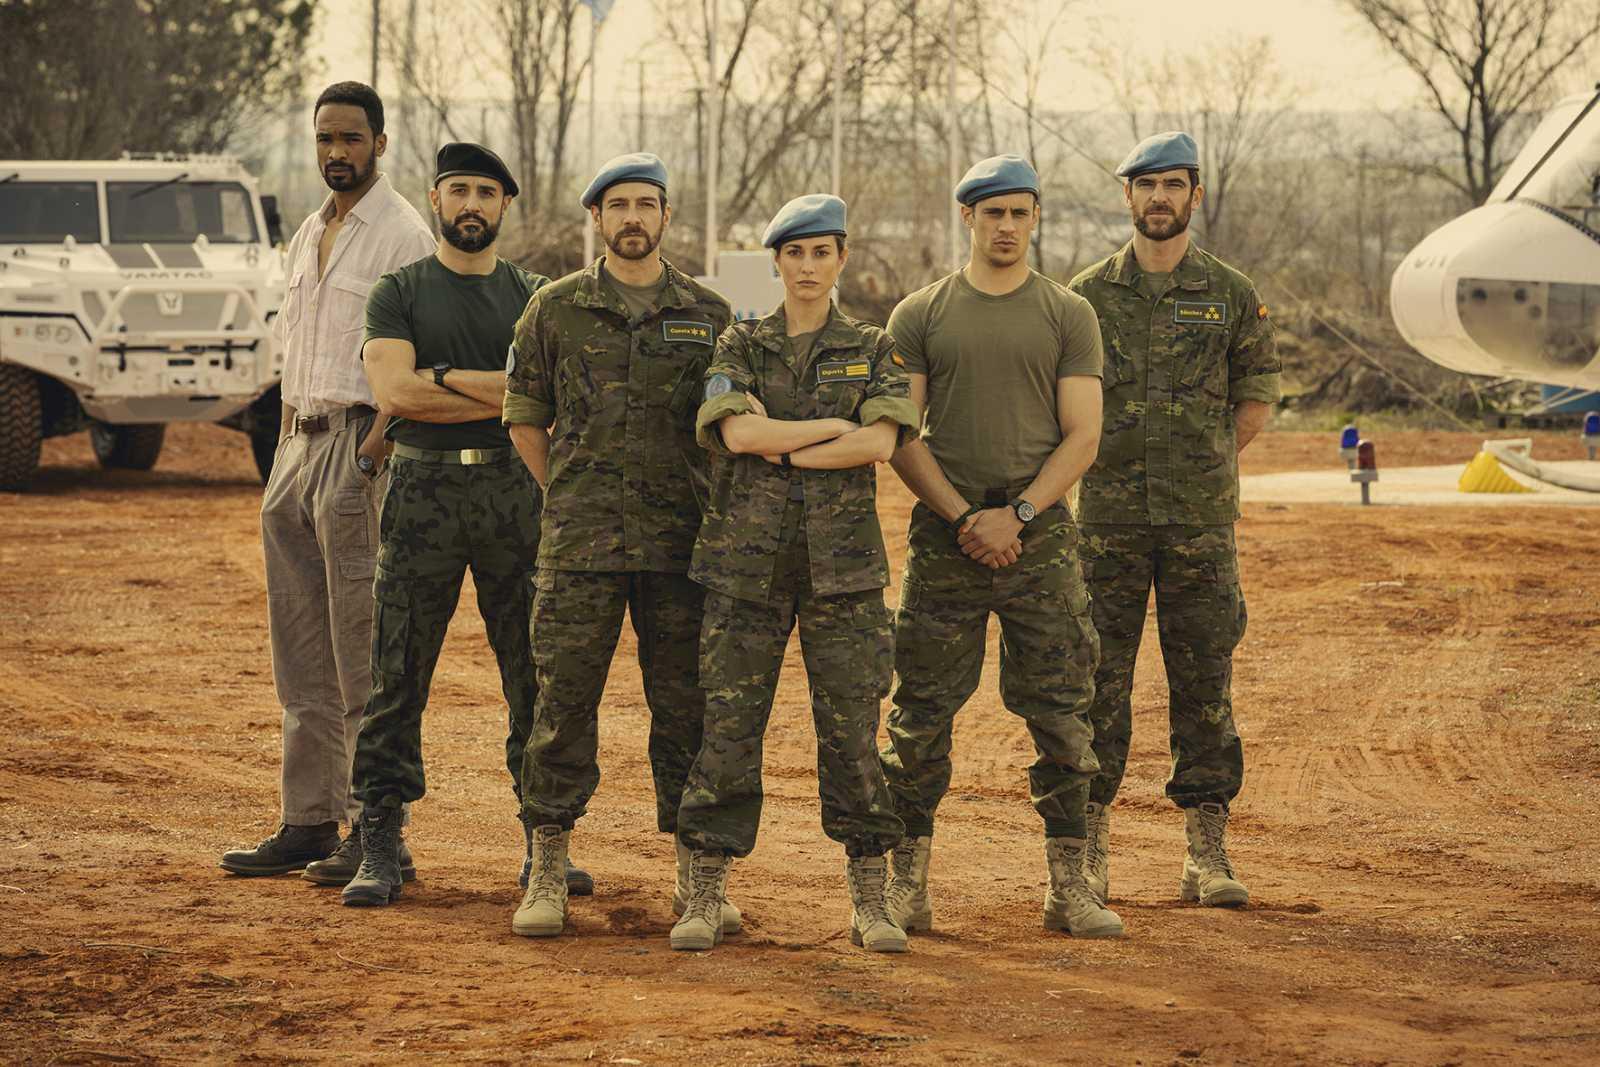 Will Sephard, Alain Hernández, Félix Gómez, Silvia Alonso, Martiño Rivas y Alfonso Bassave, protagonistas de 'Fuerza de paz'